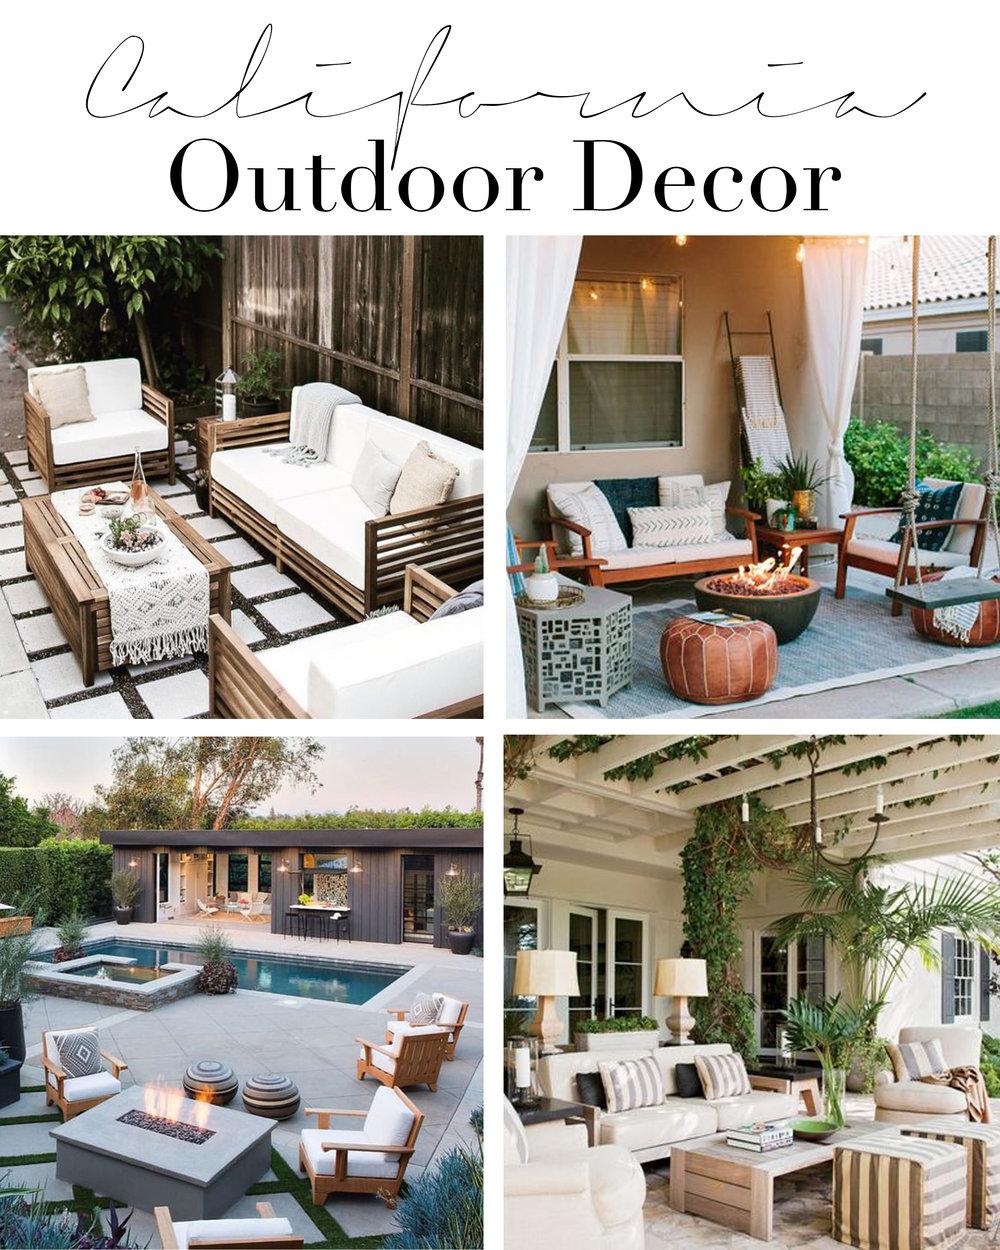 fizz-fade-outdoor-decor.jpg